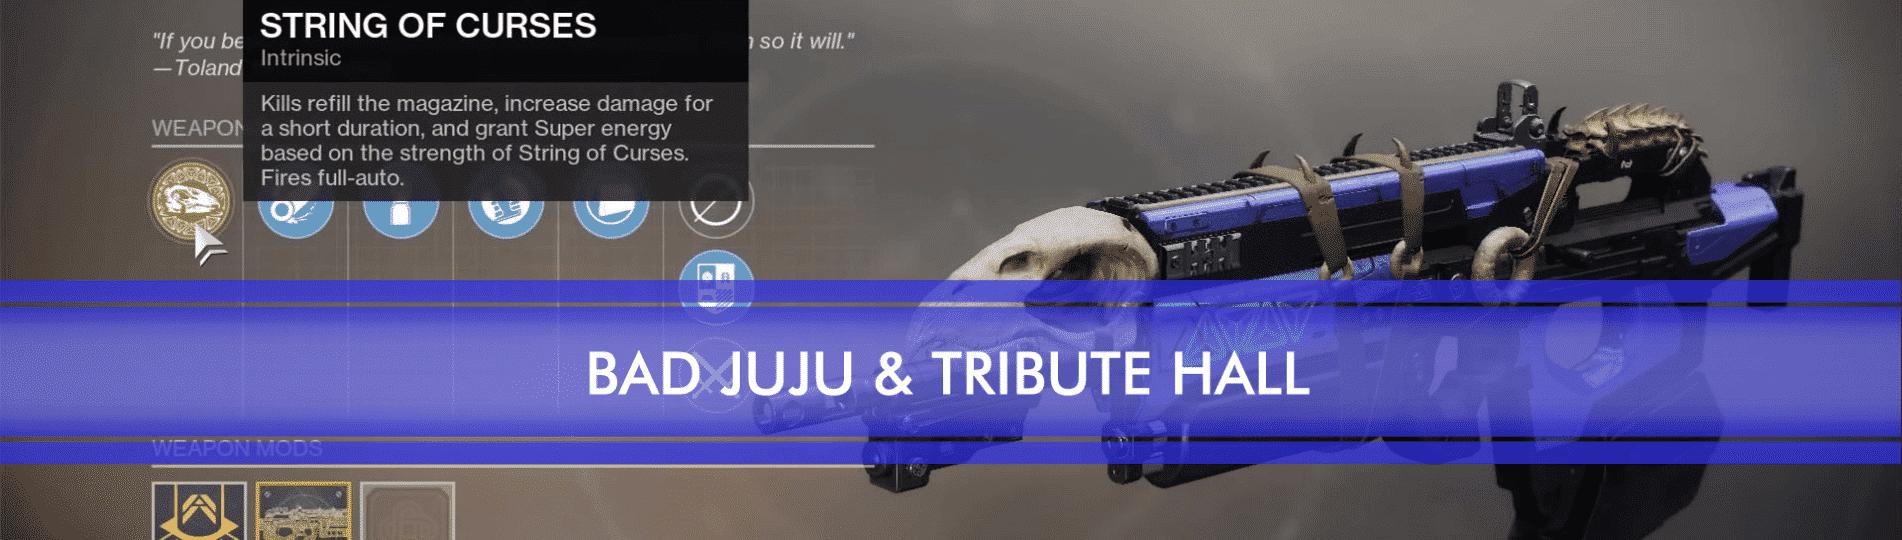 bad juju post image